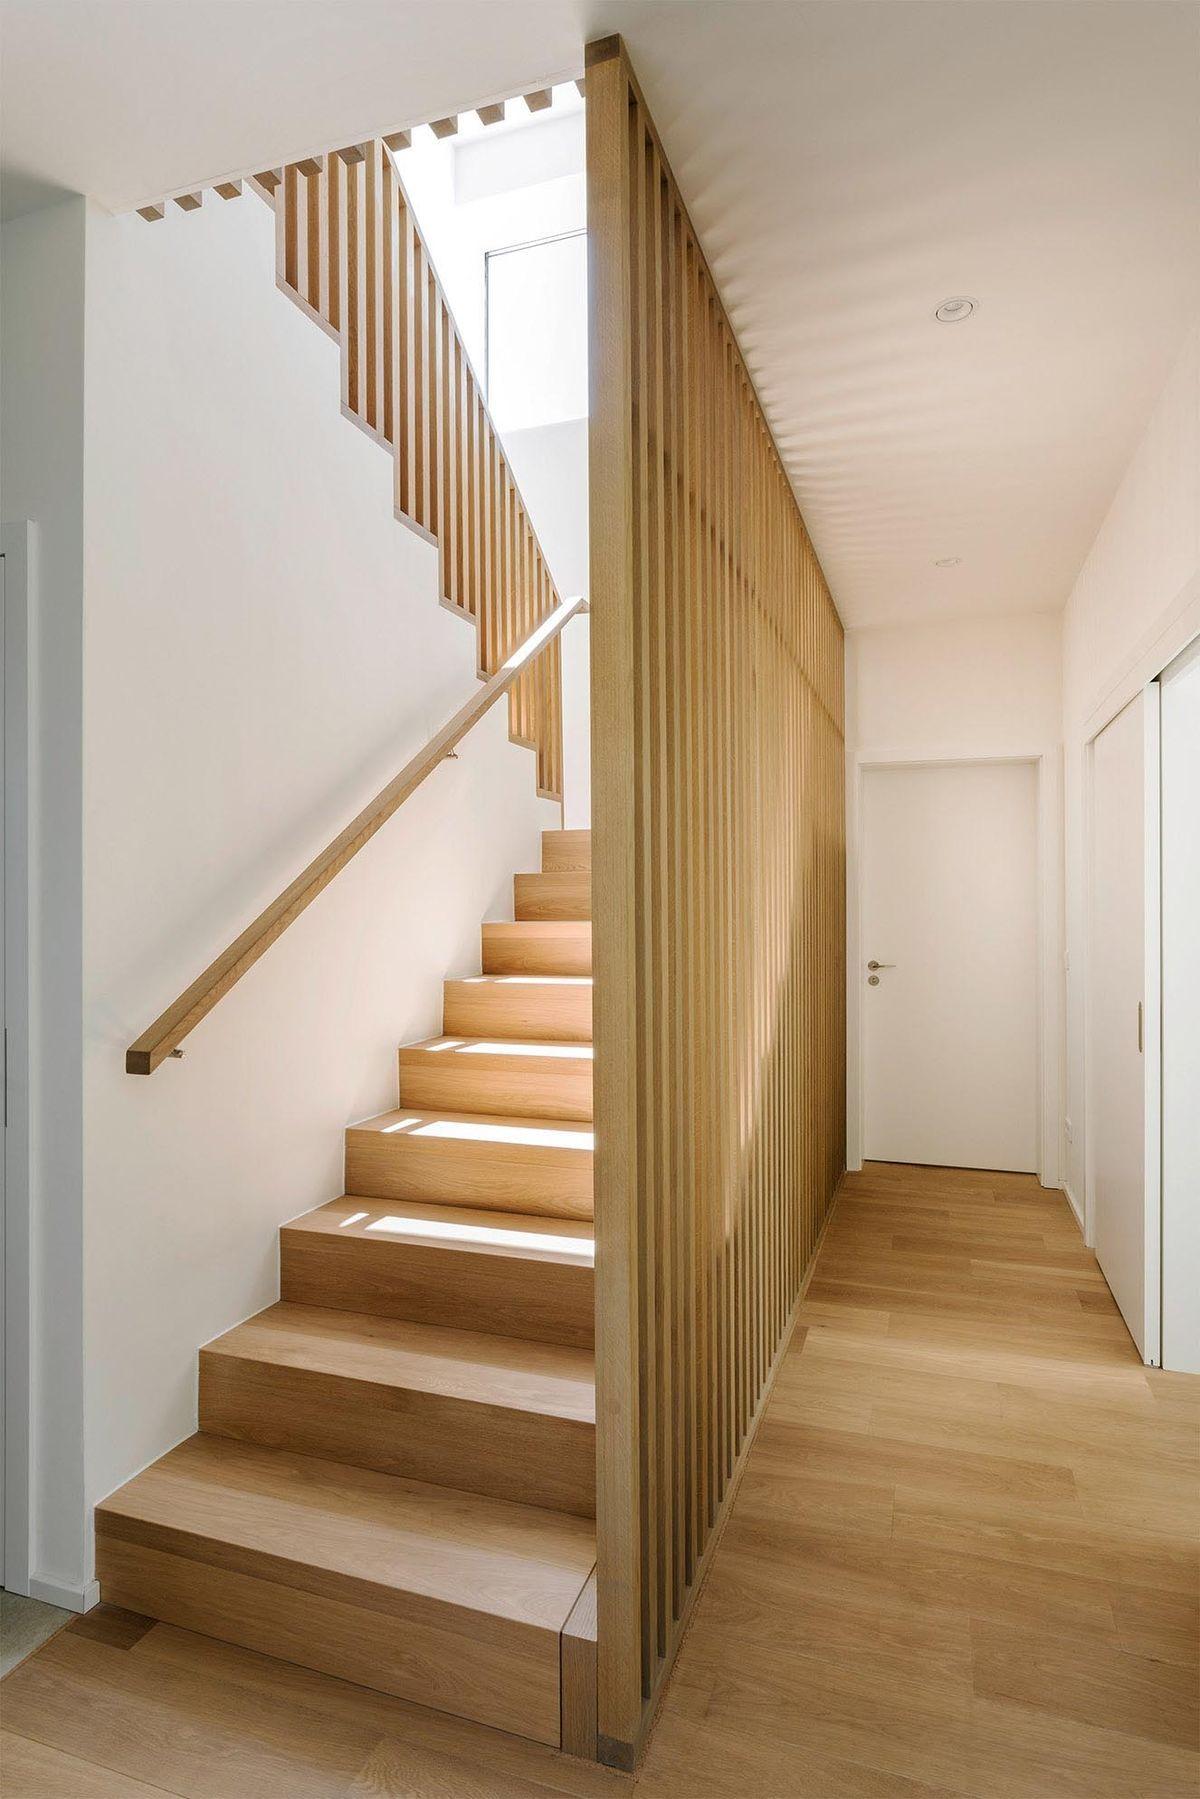 Stairs Railing Vertical Modern Wood Railings For Stairs Wooden   Modern Wooden Staircase Designs   Wood Carving Wooden Railing   Railing   Designer   Gallery   Layout